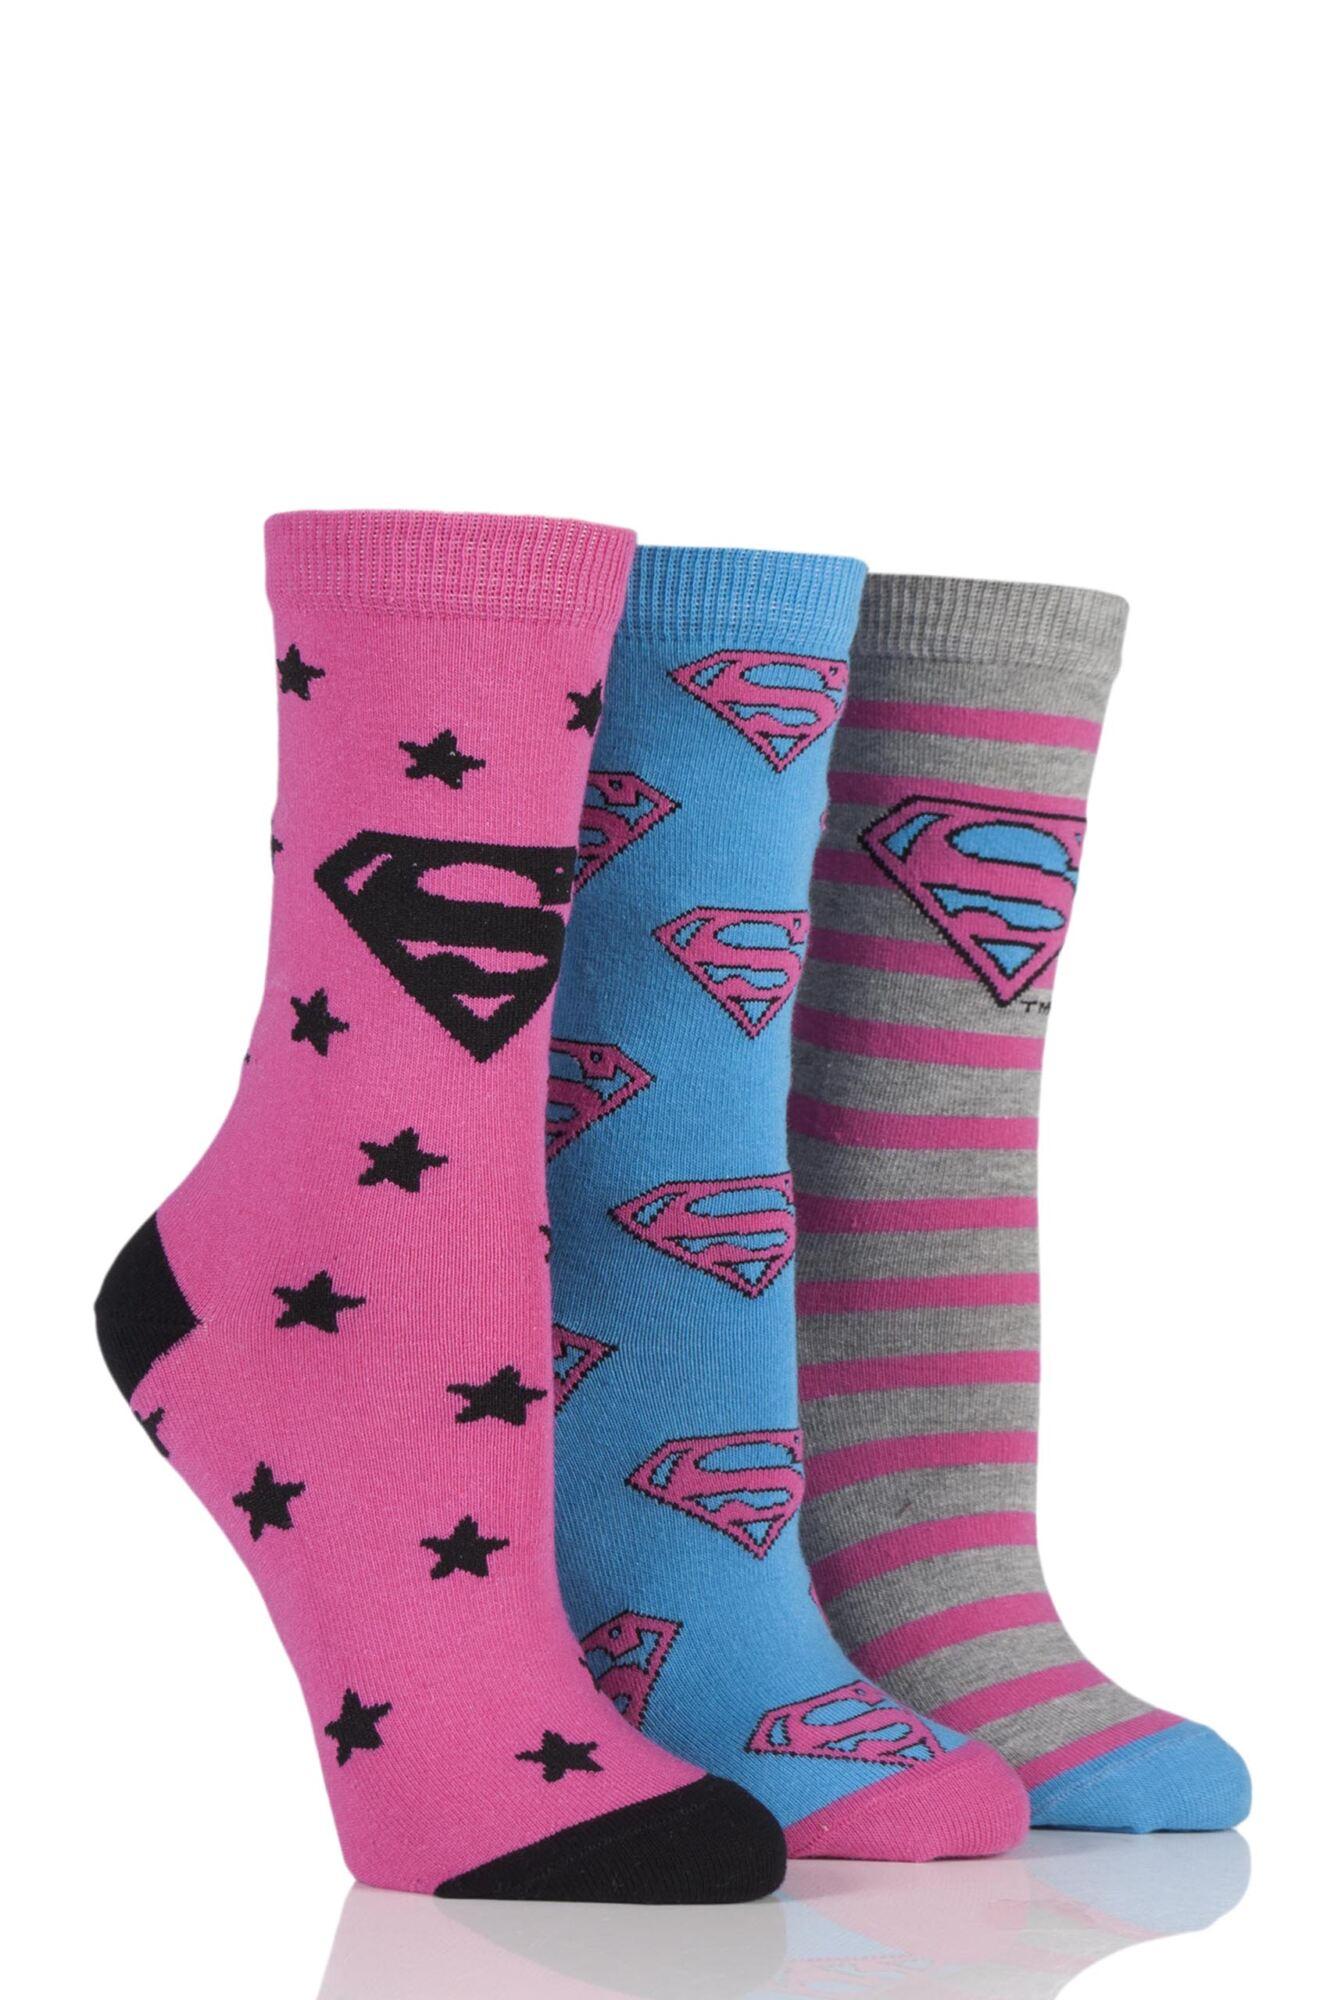 3 Pair DC Superman / Supergirl Logo Socks Ladies - Film & TV Characters